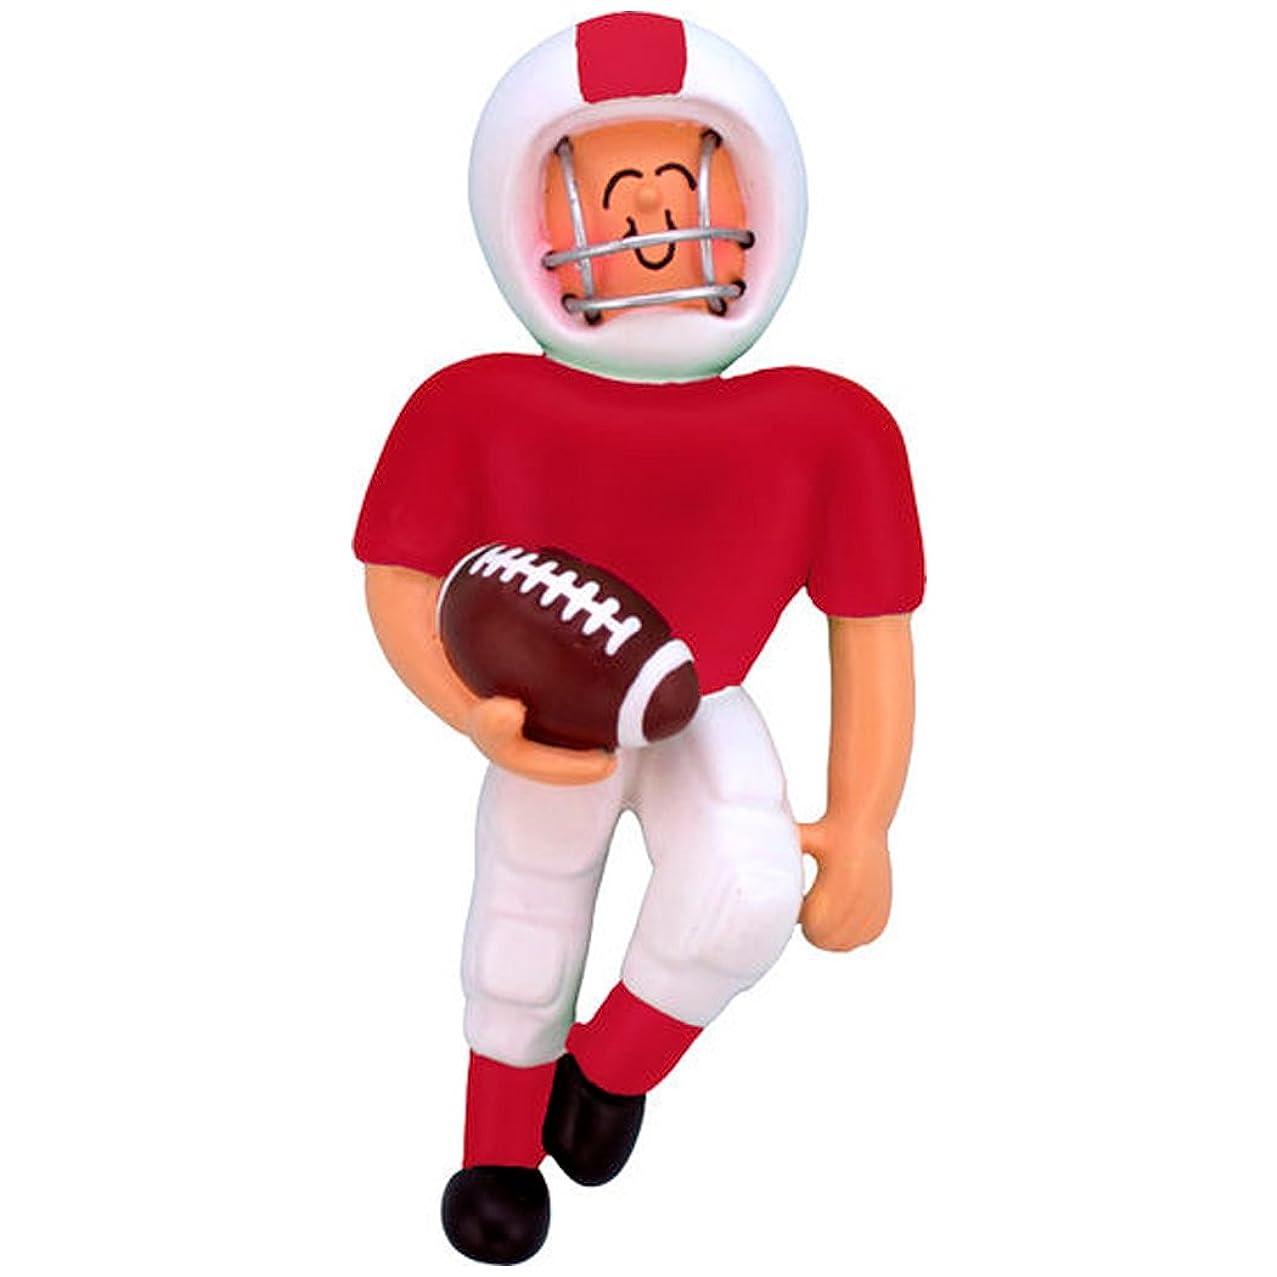 Personalized Playing Football Boy Christmas Tree Ornament 2019 - Team Man Athlete Helmet Running Score Profession Hobby Goal Star School Coach Grand-Son - Free Customization (Red Uniform)